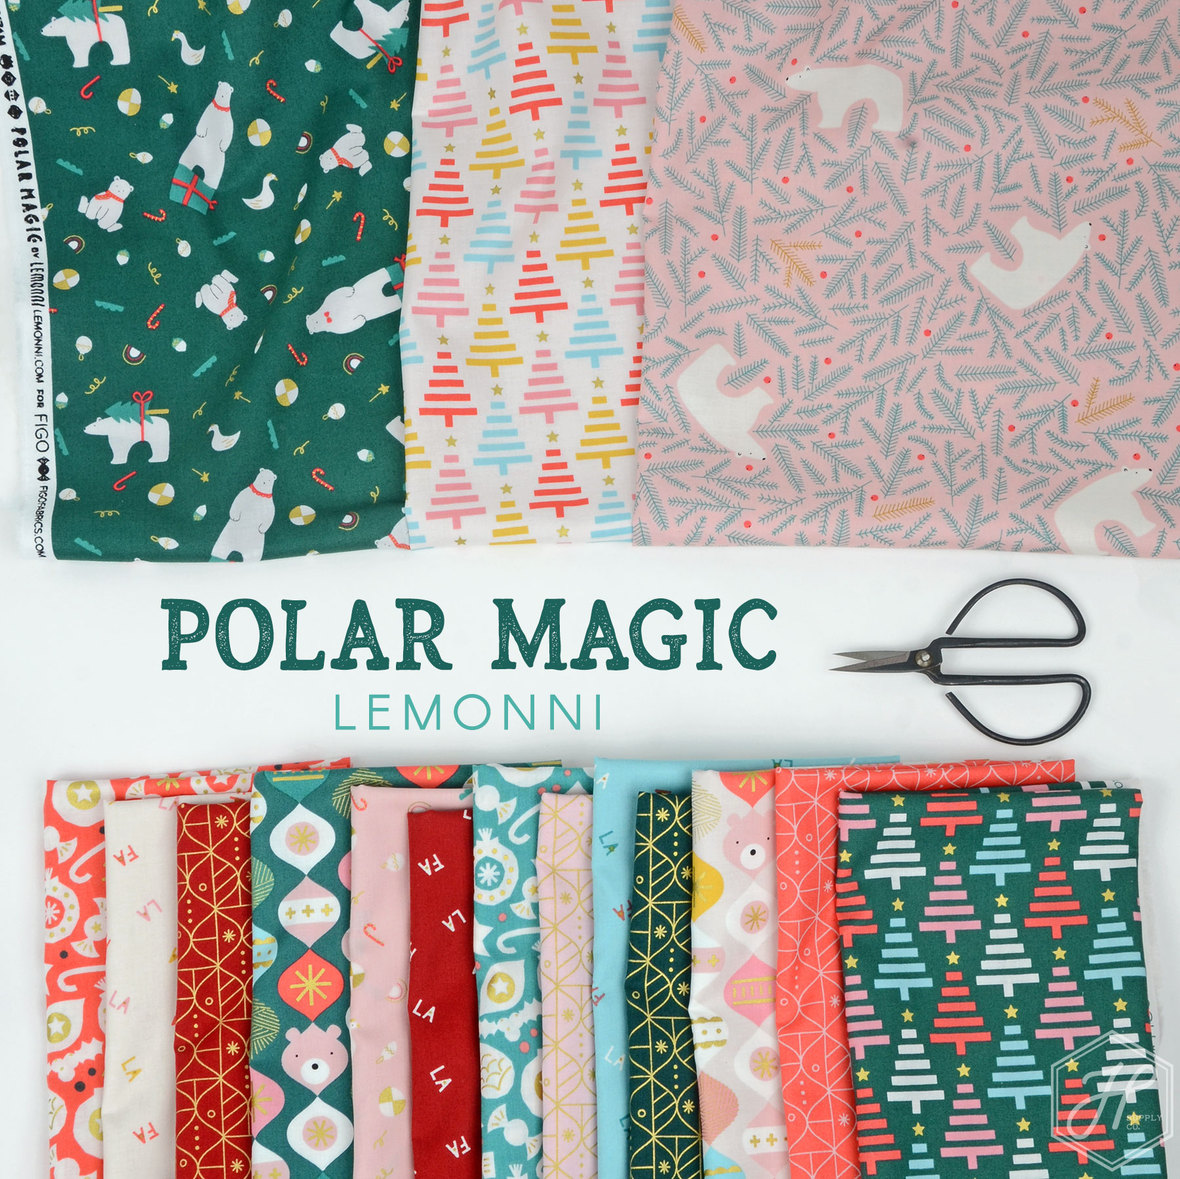 Polar-Magic-Fabric-Poster-Lemonni-for-Figo-at-Hawthorne-Supply-Co